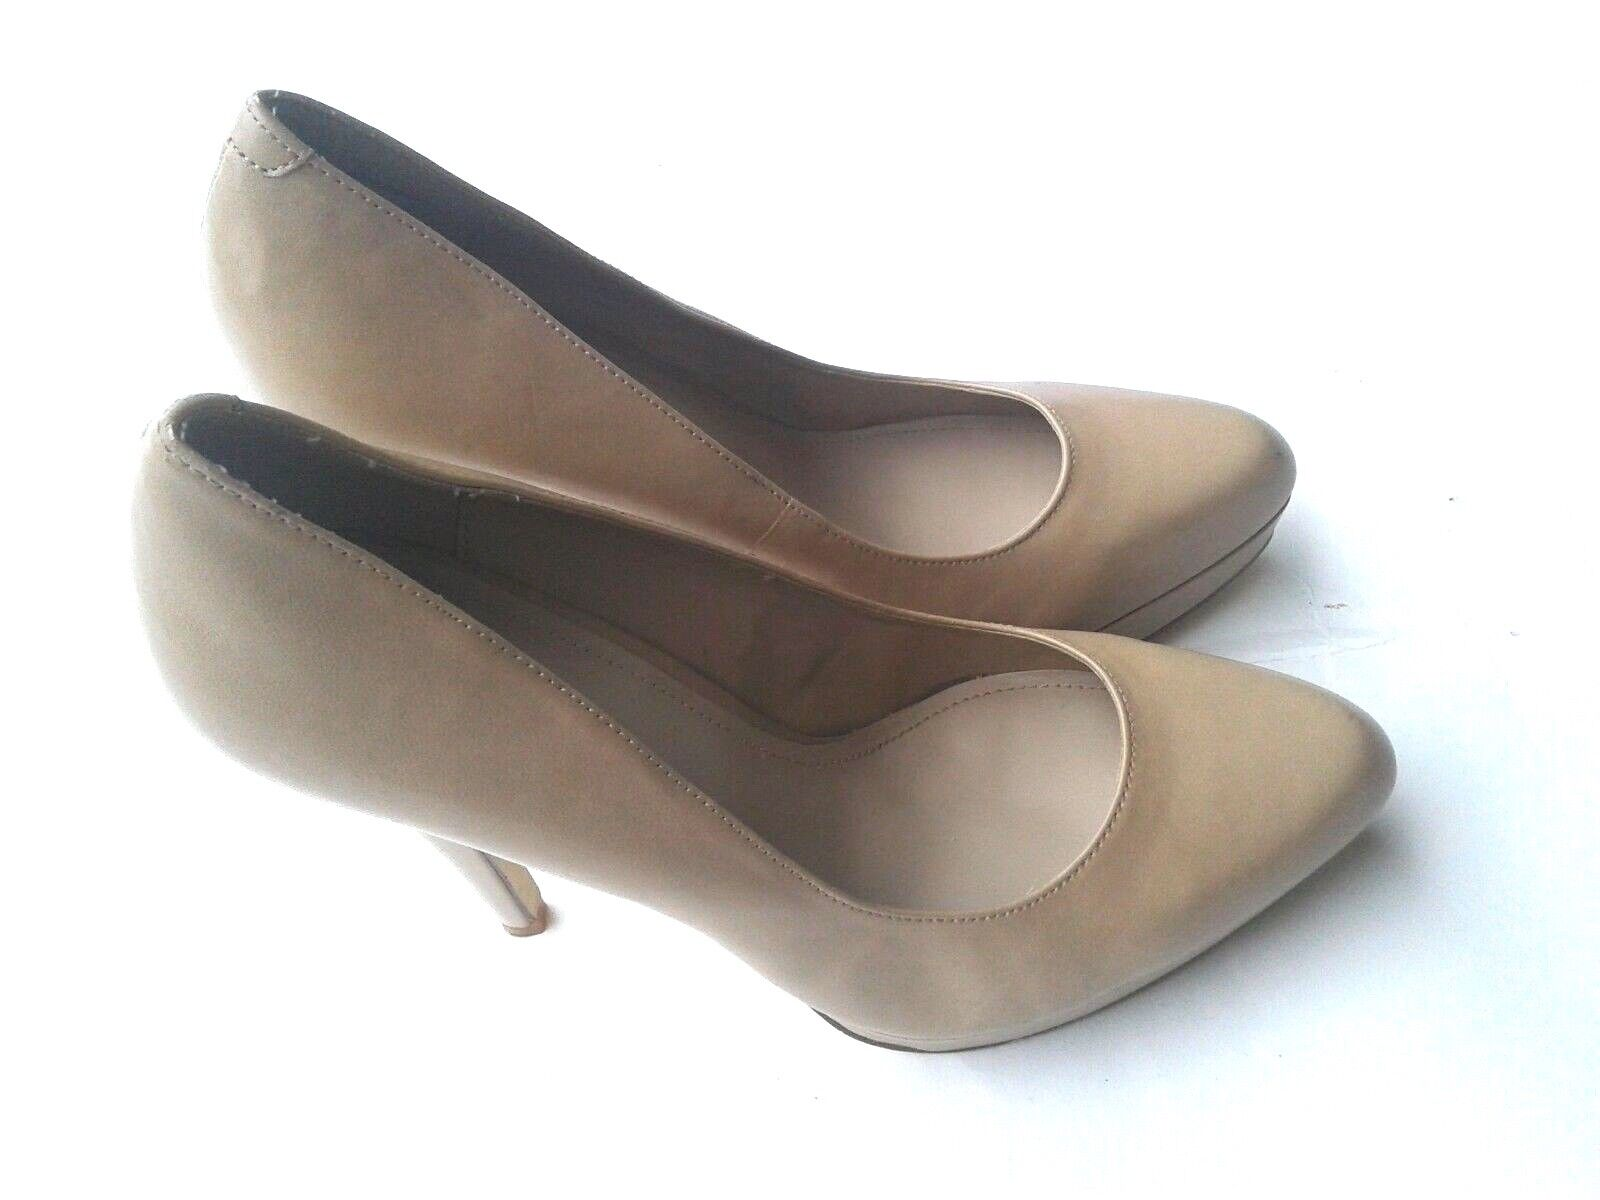 ALDO Tan Size 10 40 High Heel Pump shoes NWOB